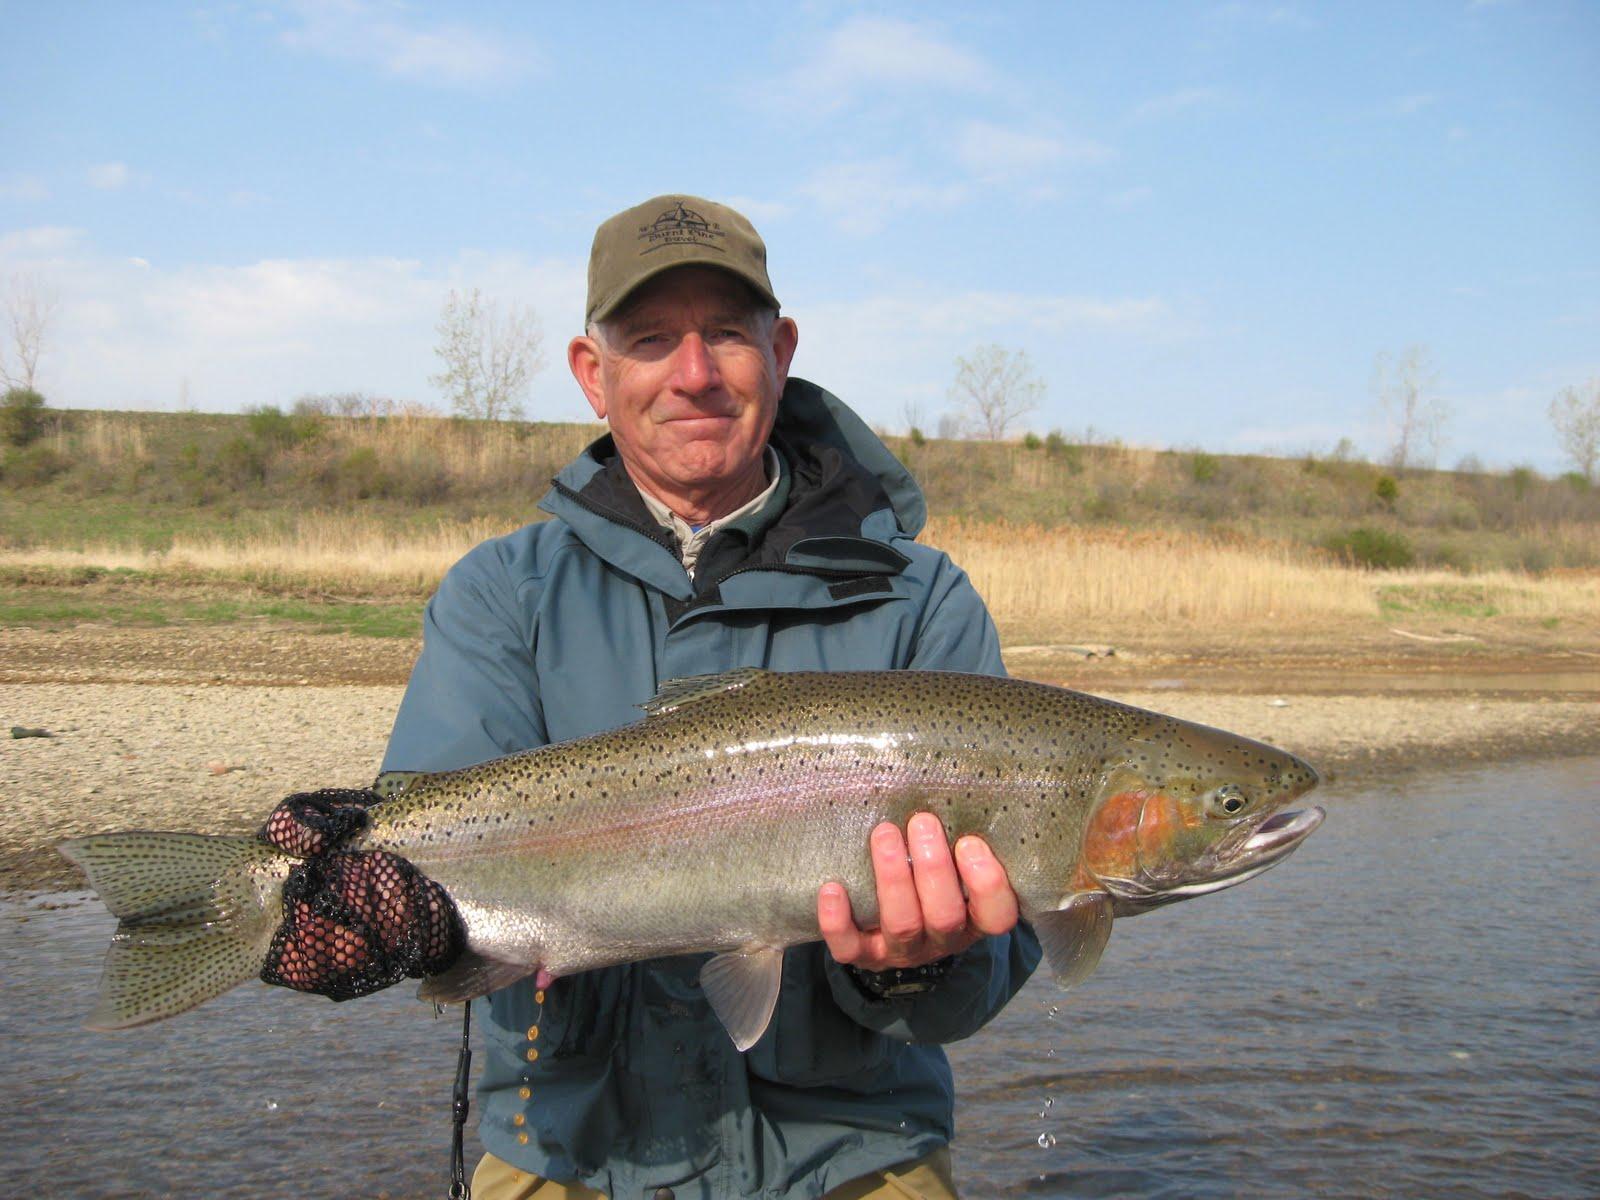 Pa ohio steelhead guides fly fishing reports fly tying for Fly fishing for steelhead